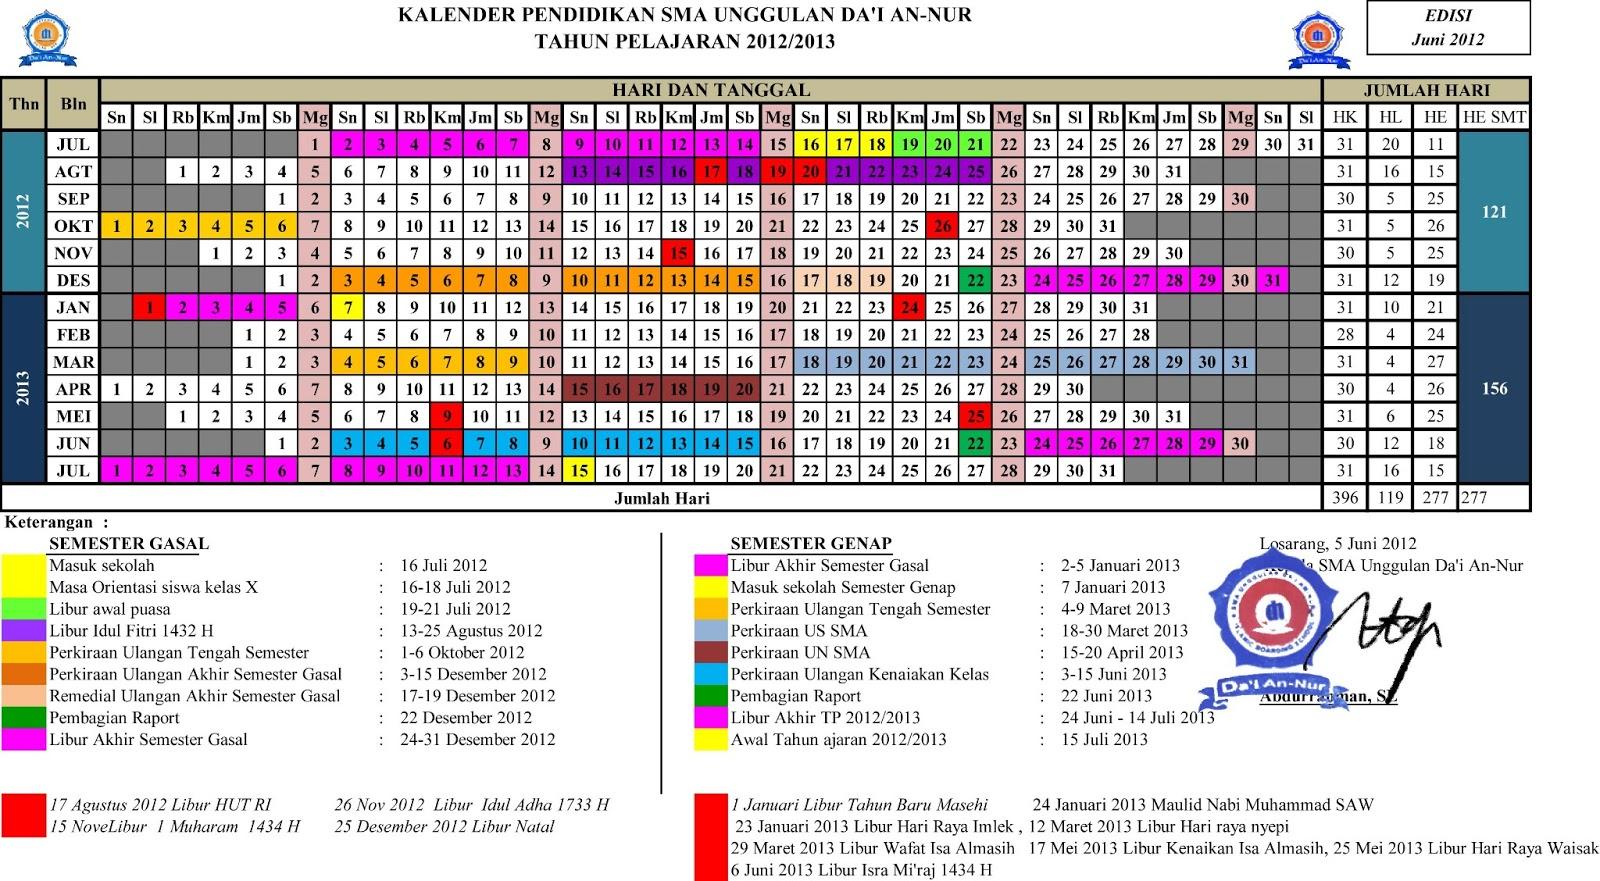 format 2012 akademik jawa exe libur kalender pendidikan 20131 150x150